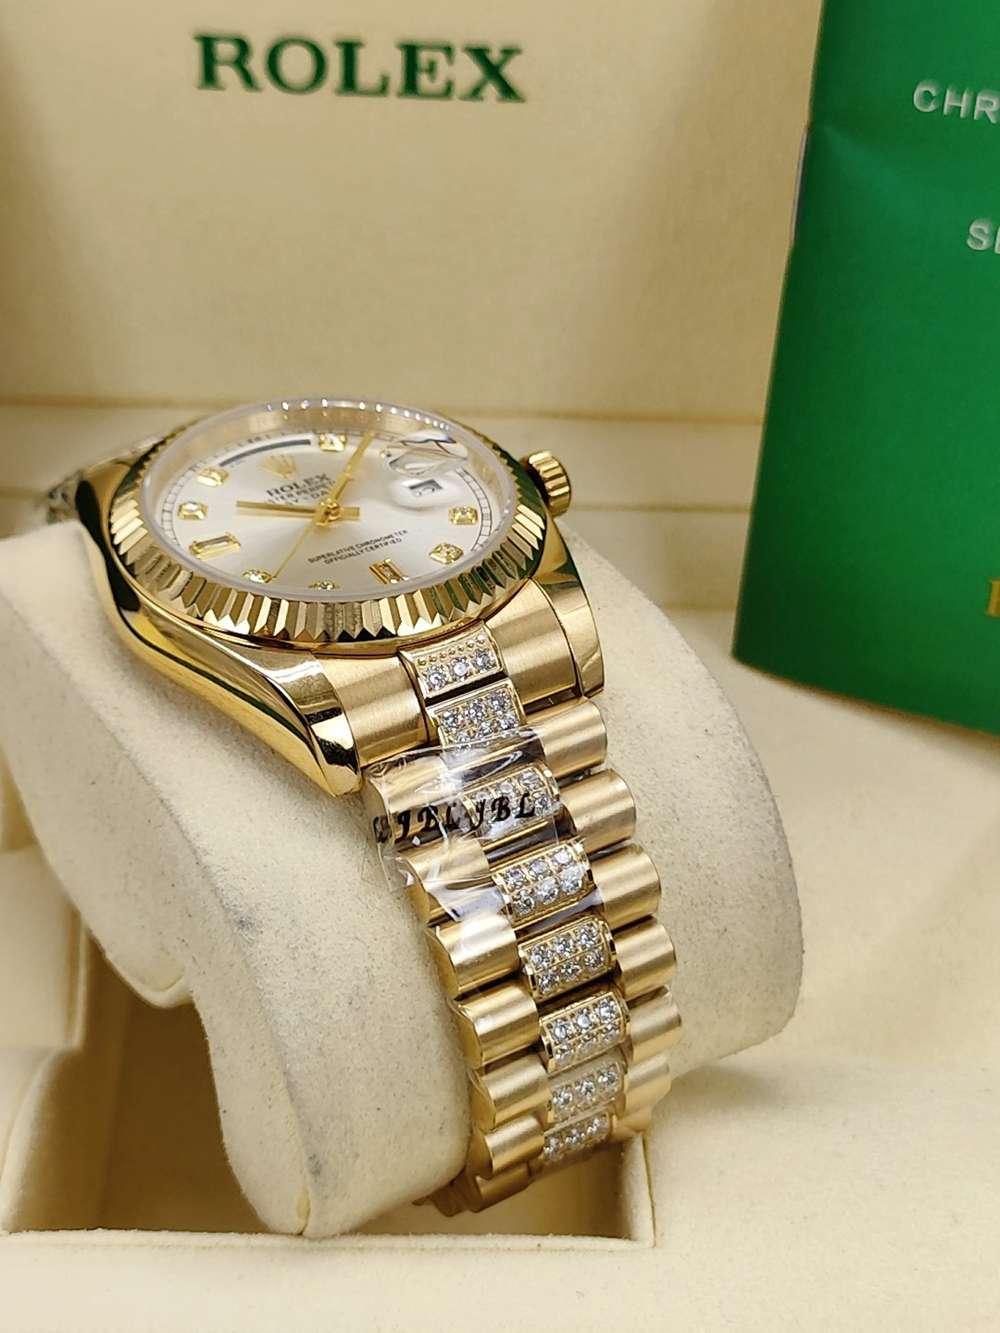 DayDate 36mm gold/silver diamonds strap AAA automatic 2813 S040